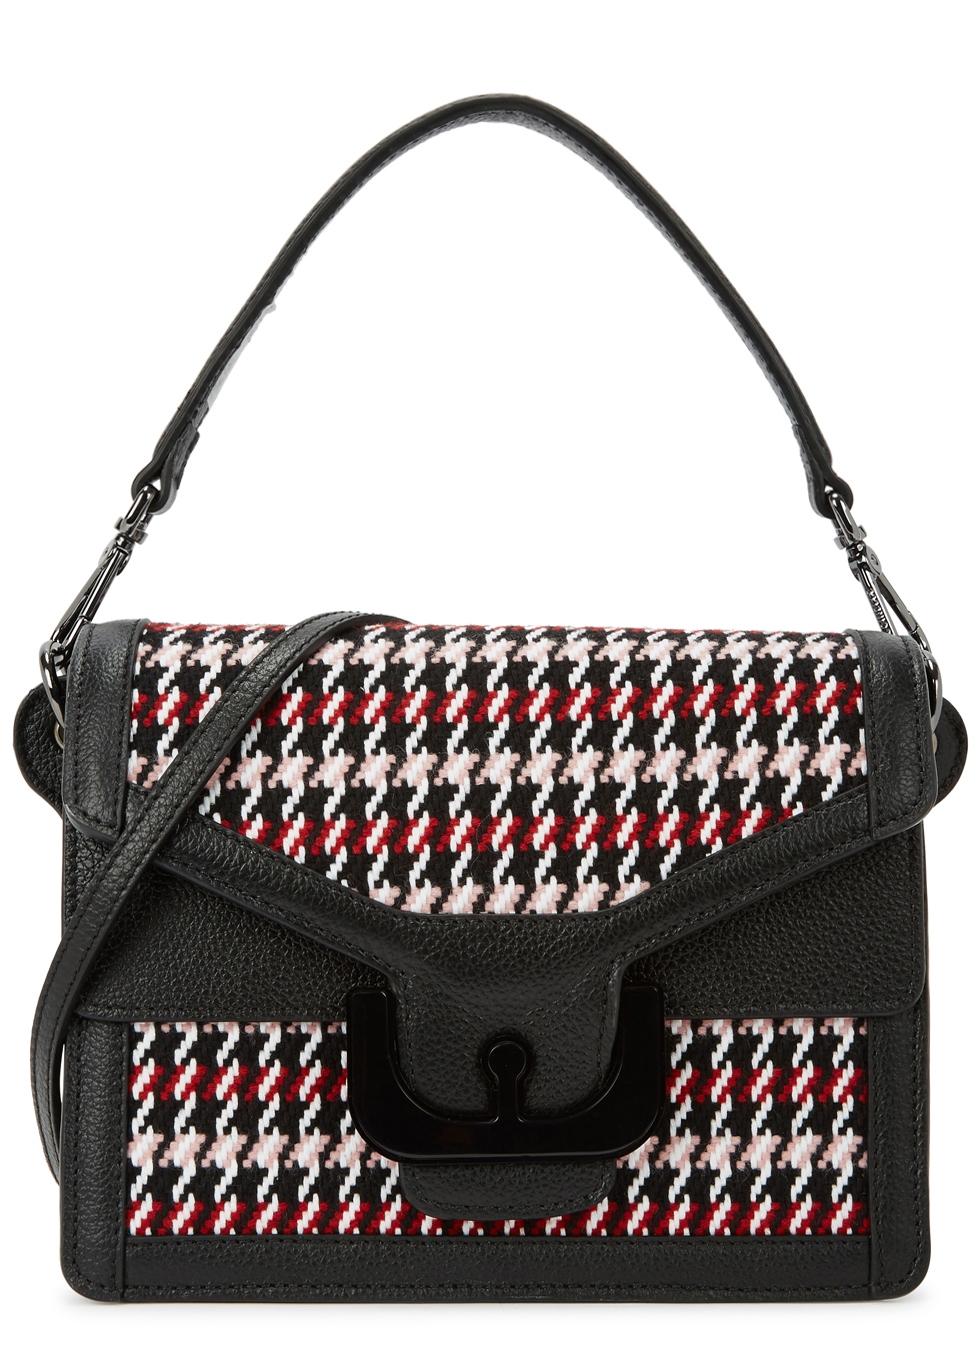 Ambrine Tweed And Leather Shoulder Bag, Multicoloured